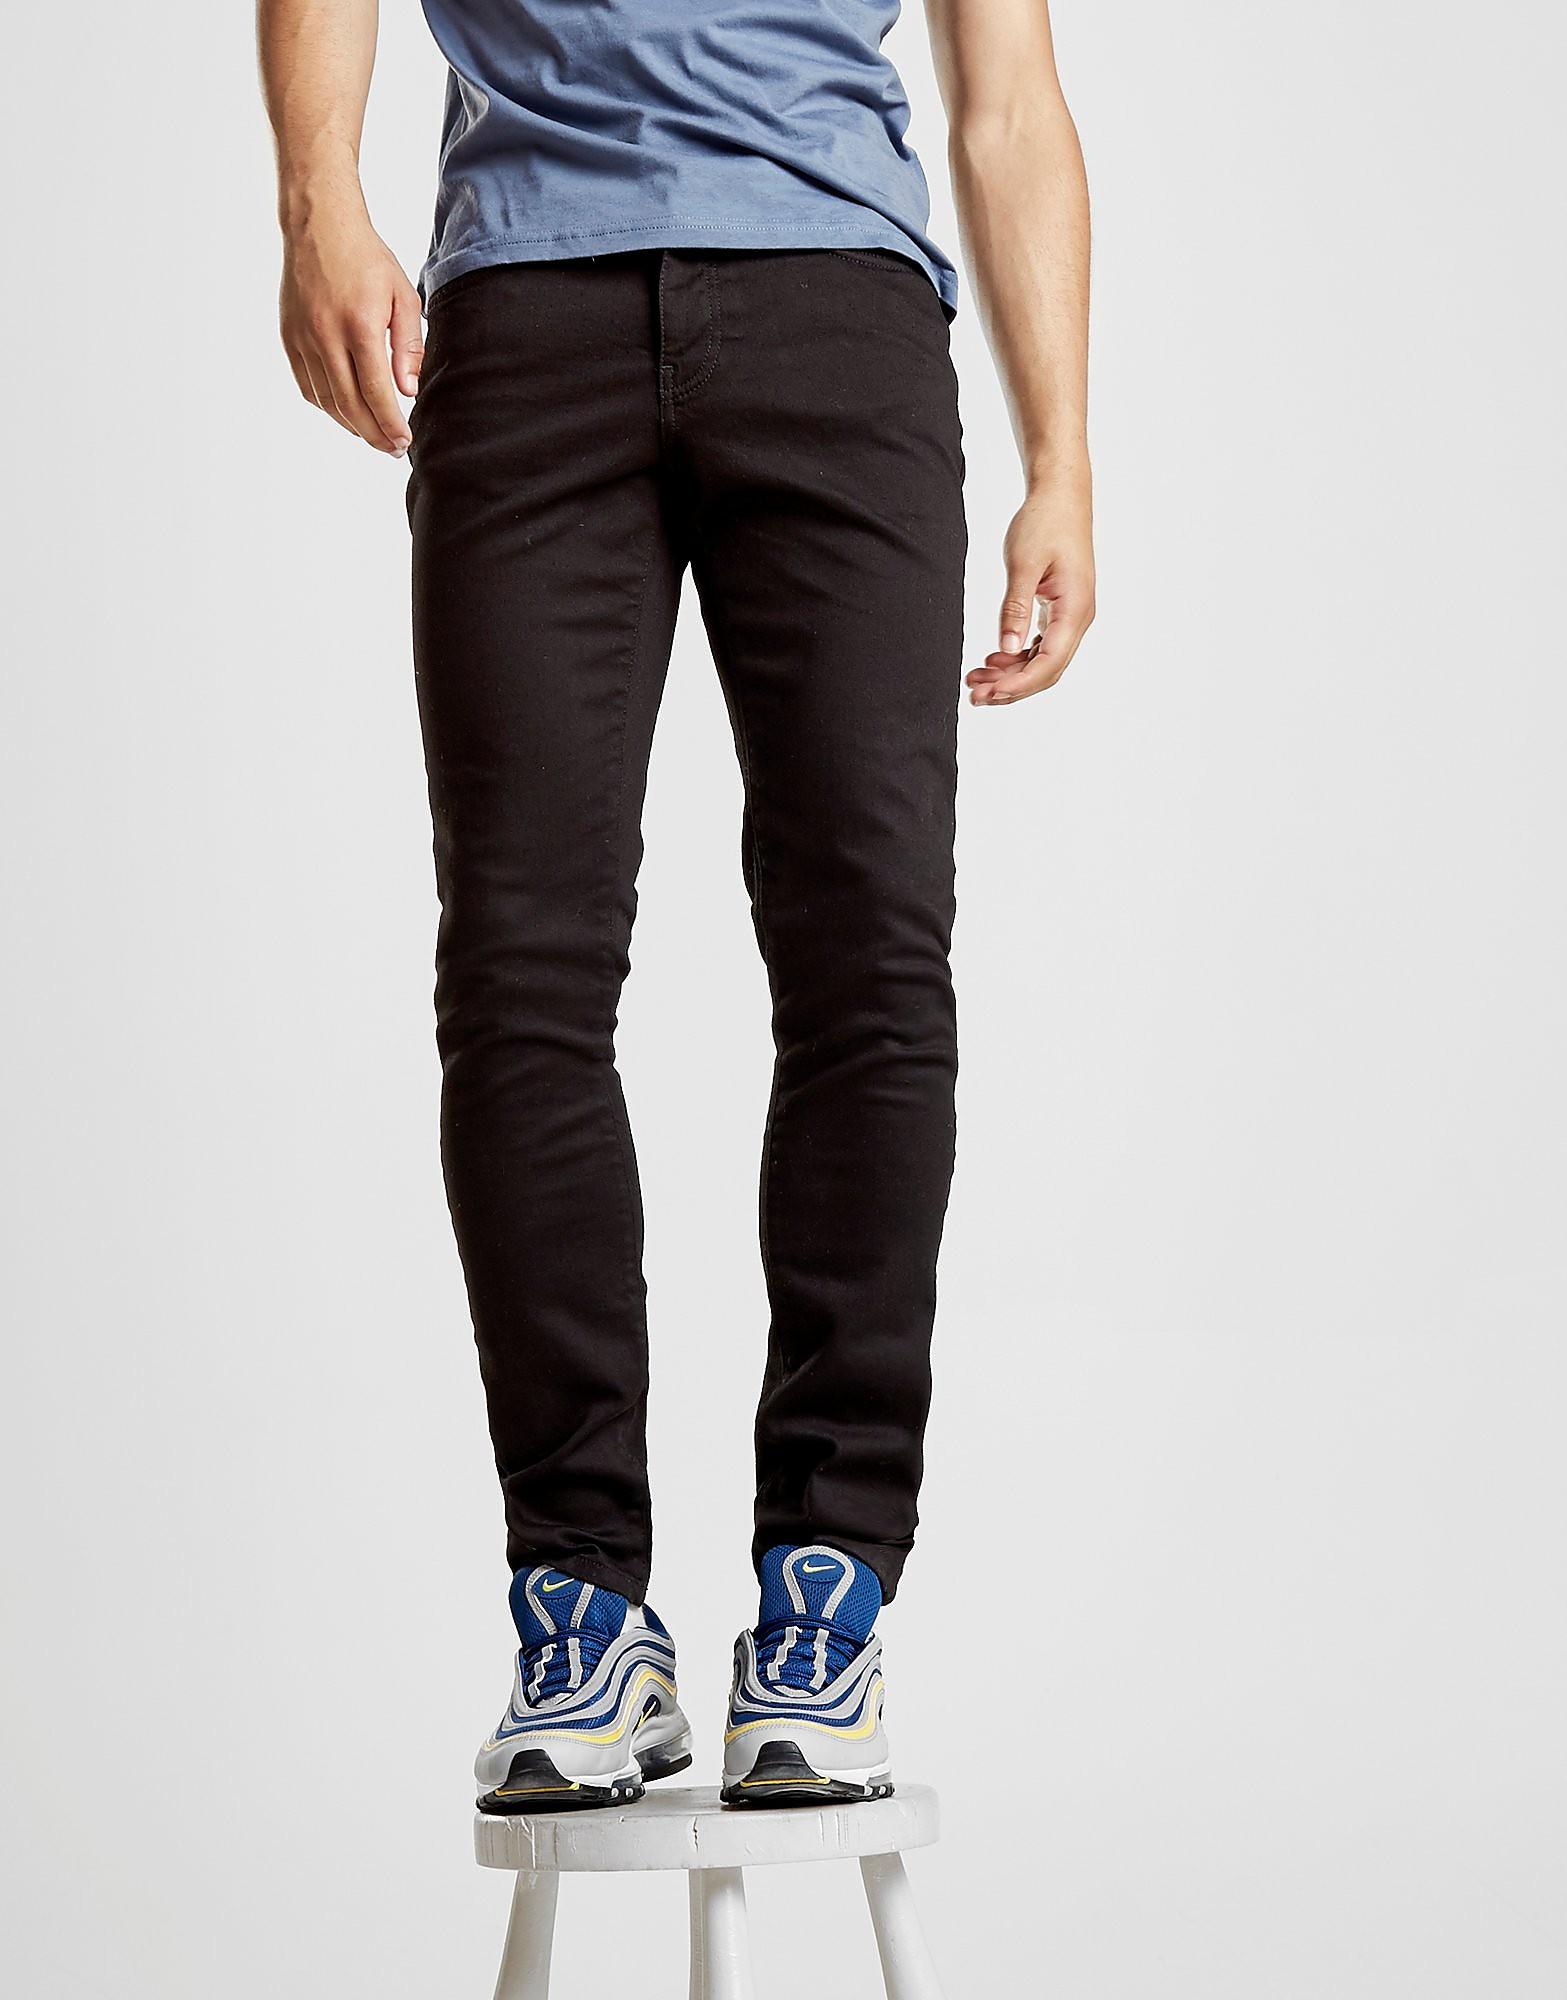 Lyle & Scott Slim Fit Denim Jeans